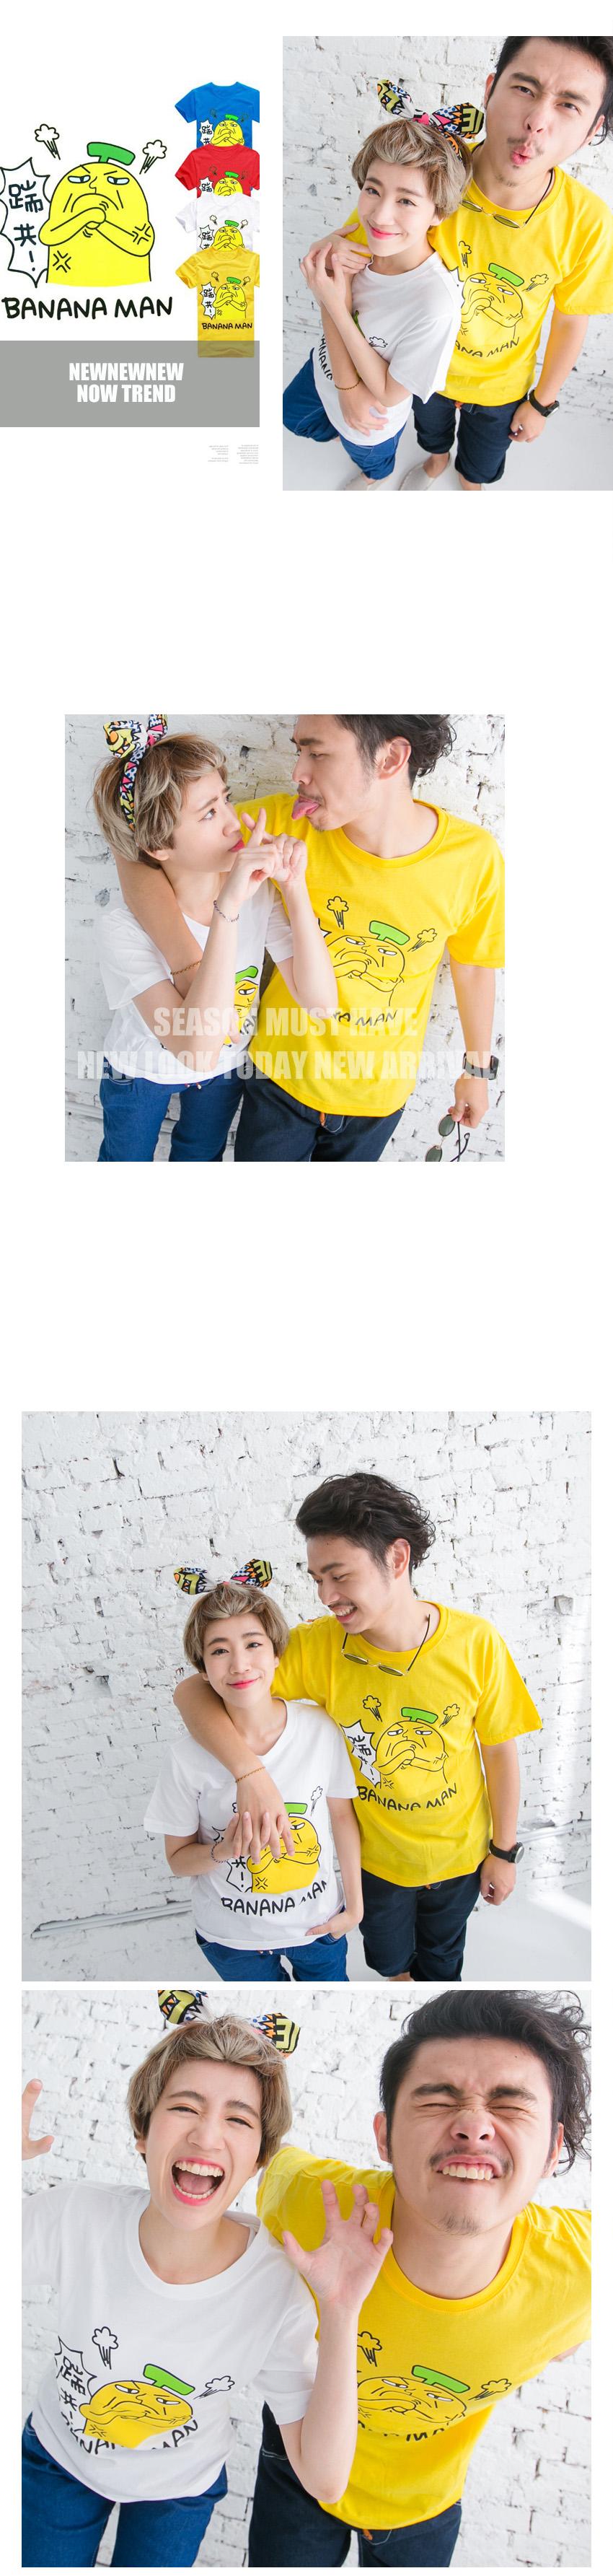 T恤.潮T.Tshirt 情侶裝.MIT純棉.KUSO.香蕉人.情侶T恤.卡通.短T.香蕉哥踹共【D0277】艾咪E舖.班服